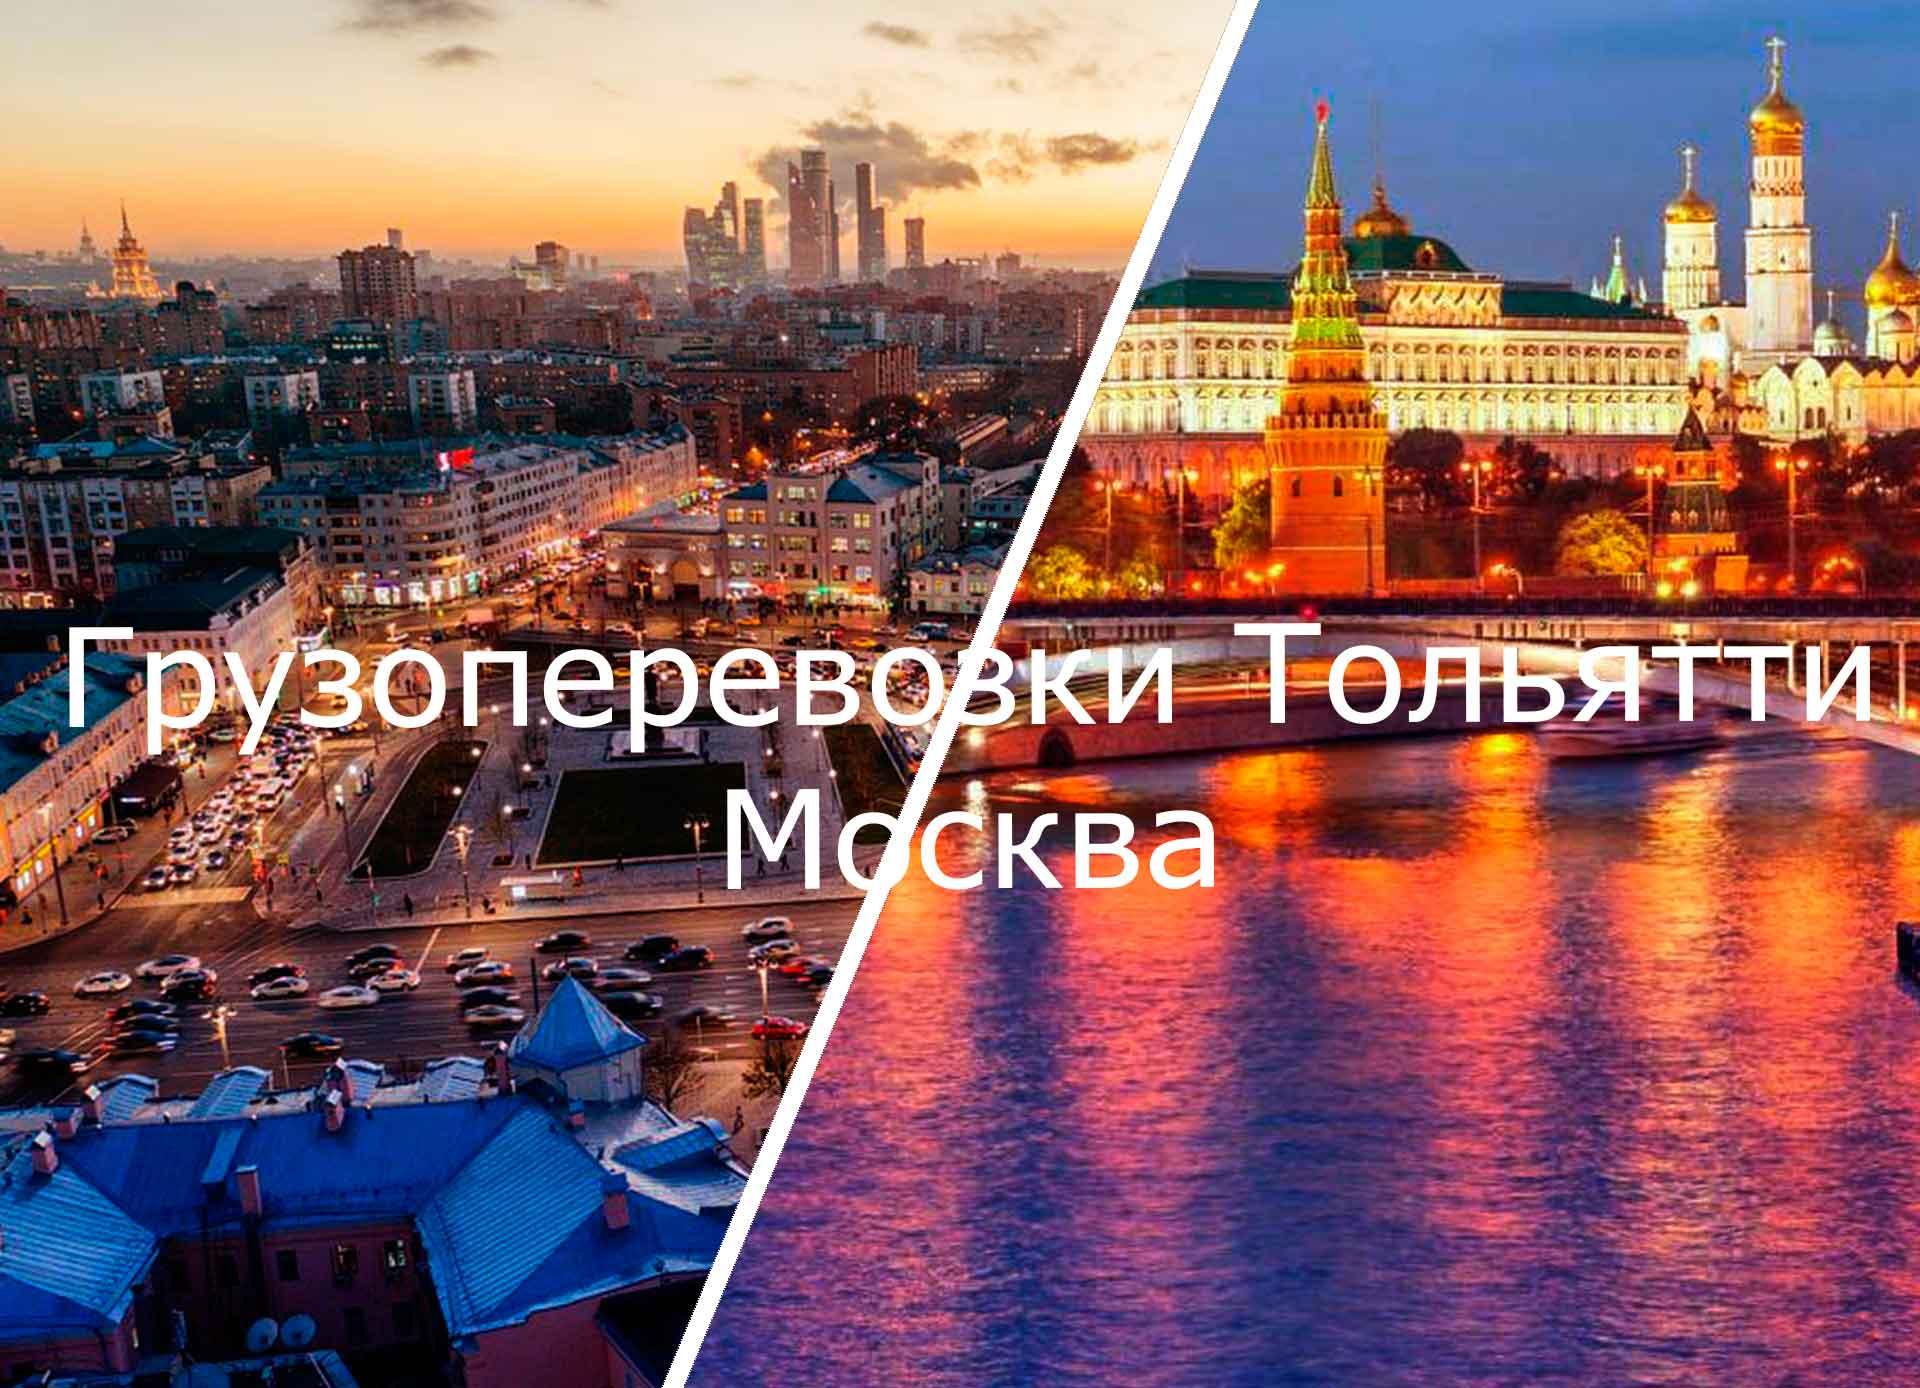 грузоперевозки тольятти москва